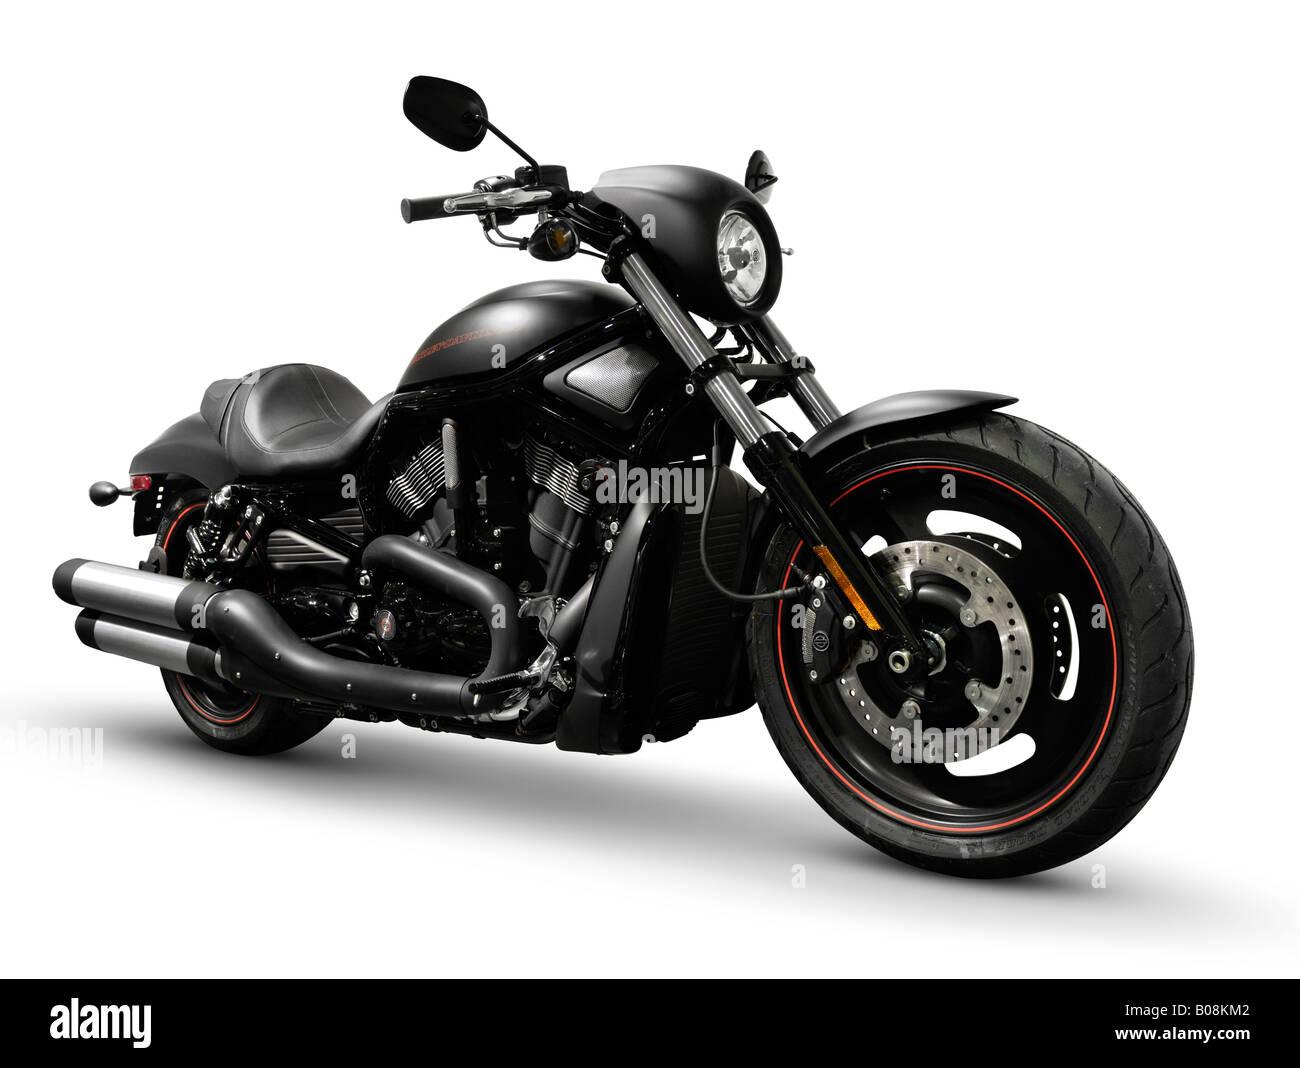 2007 Harley Davidson VRSCD Night Rod Special - Stock Image